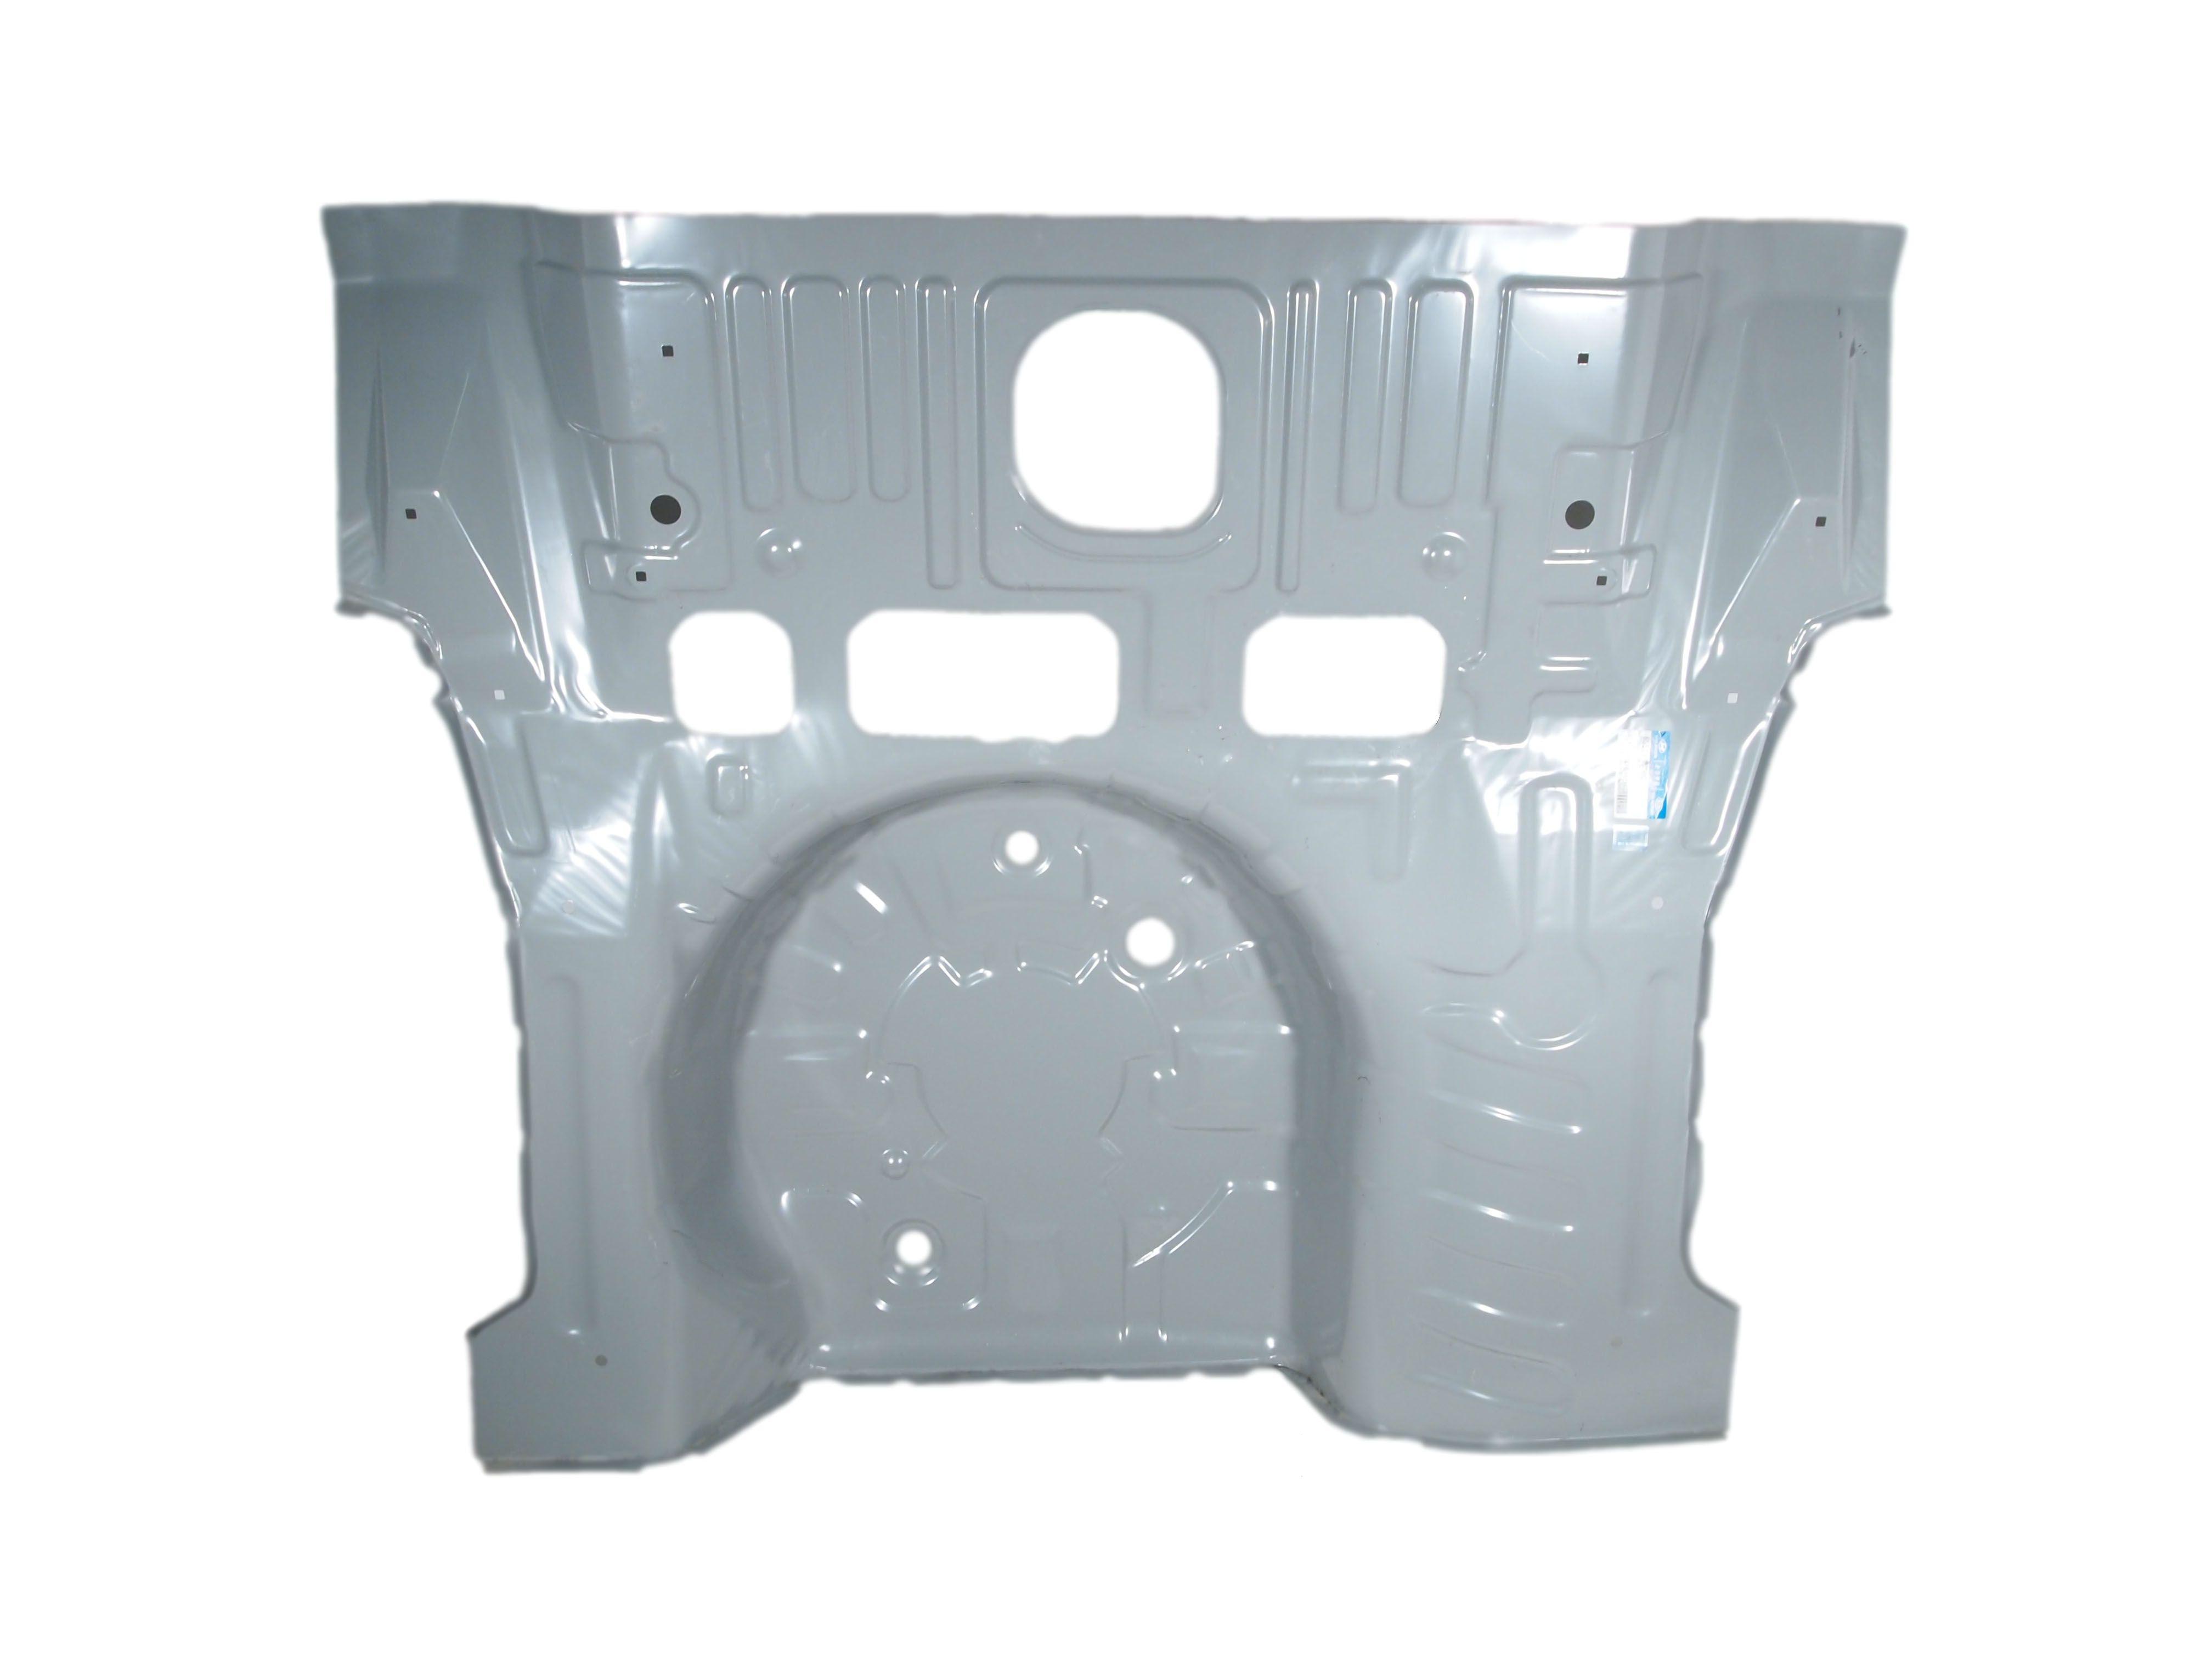 Пол багажника Hyundai Getz 2002> [655111c000] от Ravta